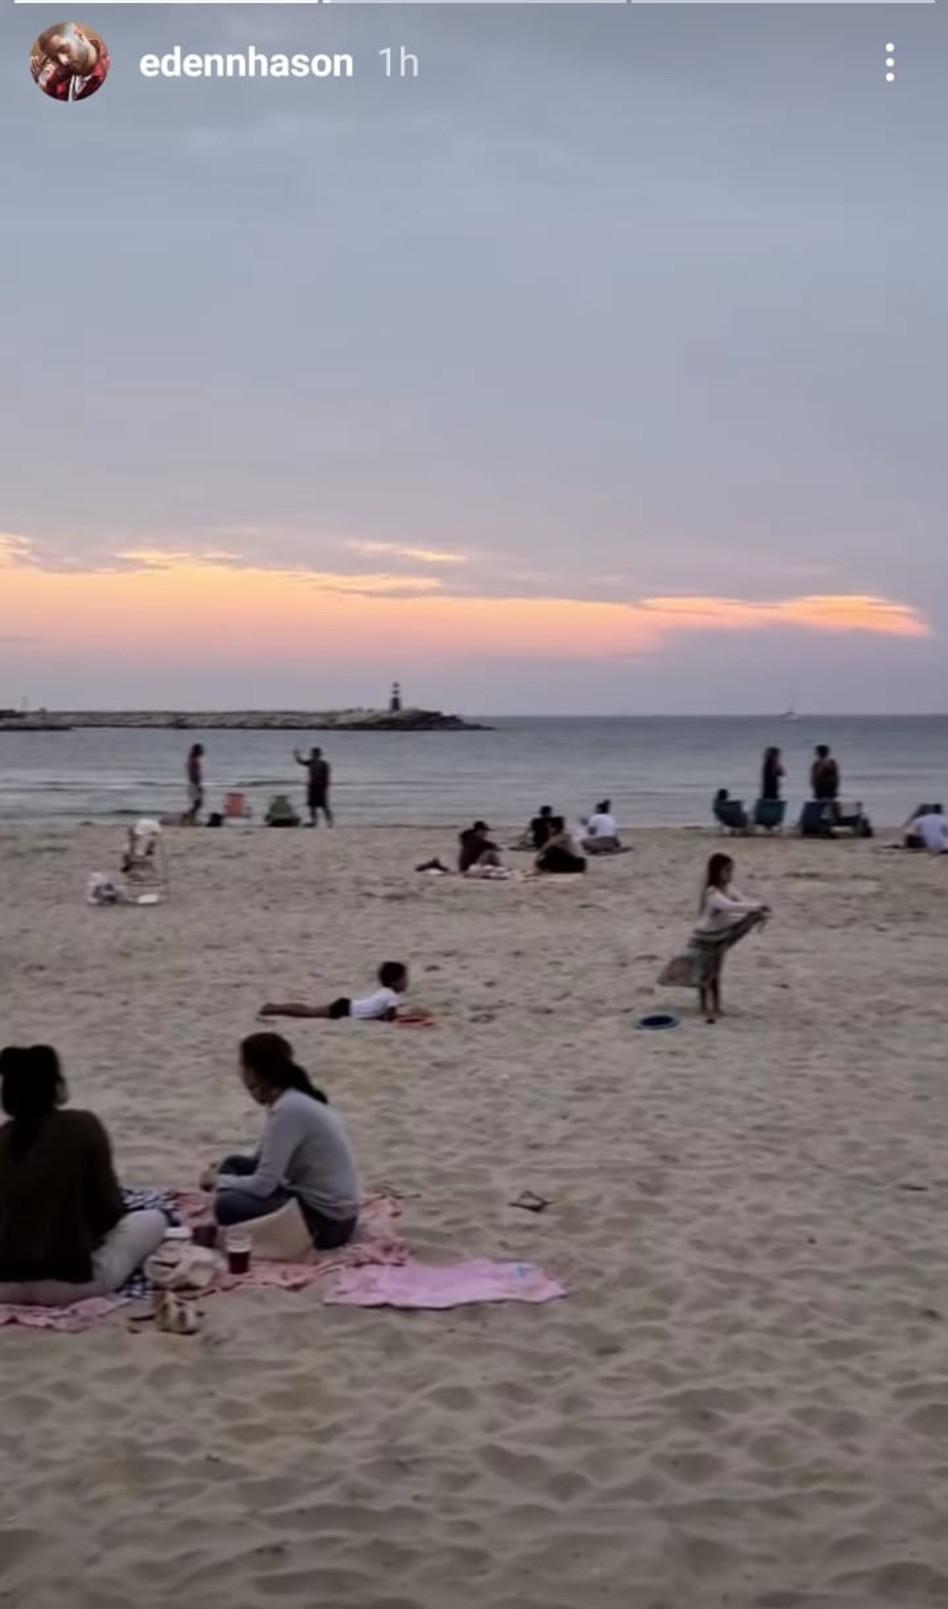 עדן חסון בים (צילום: צילום מסך אינסטגרם)